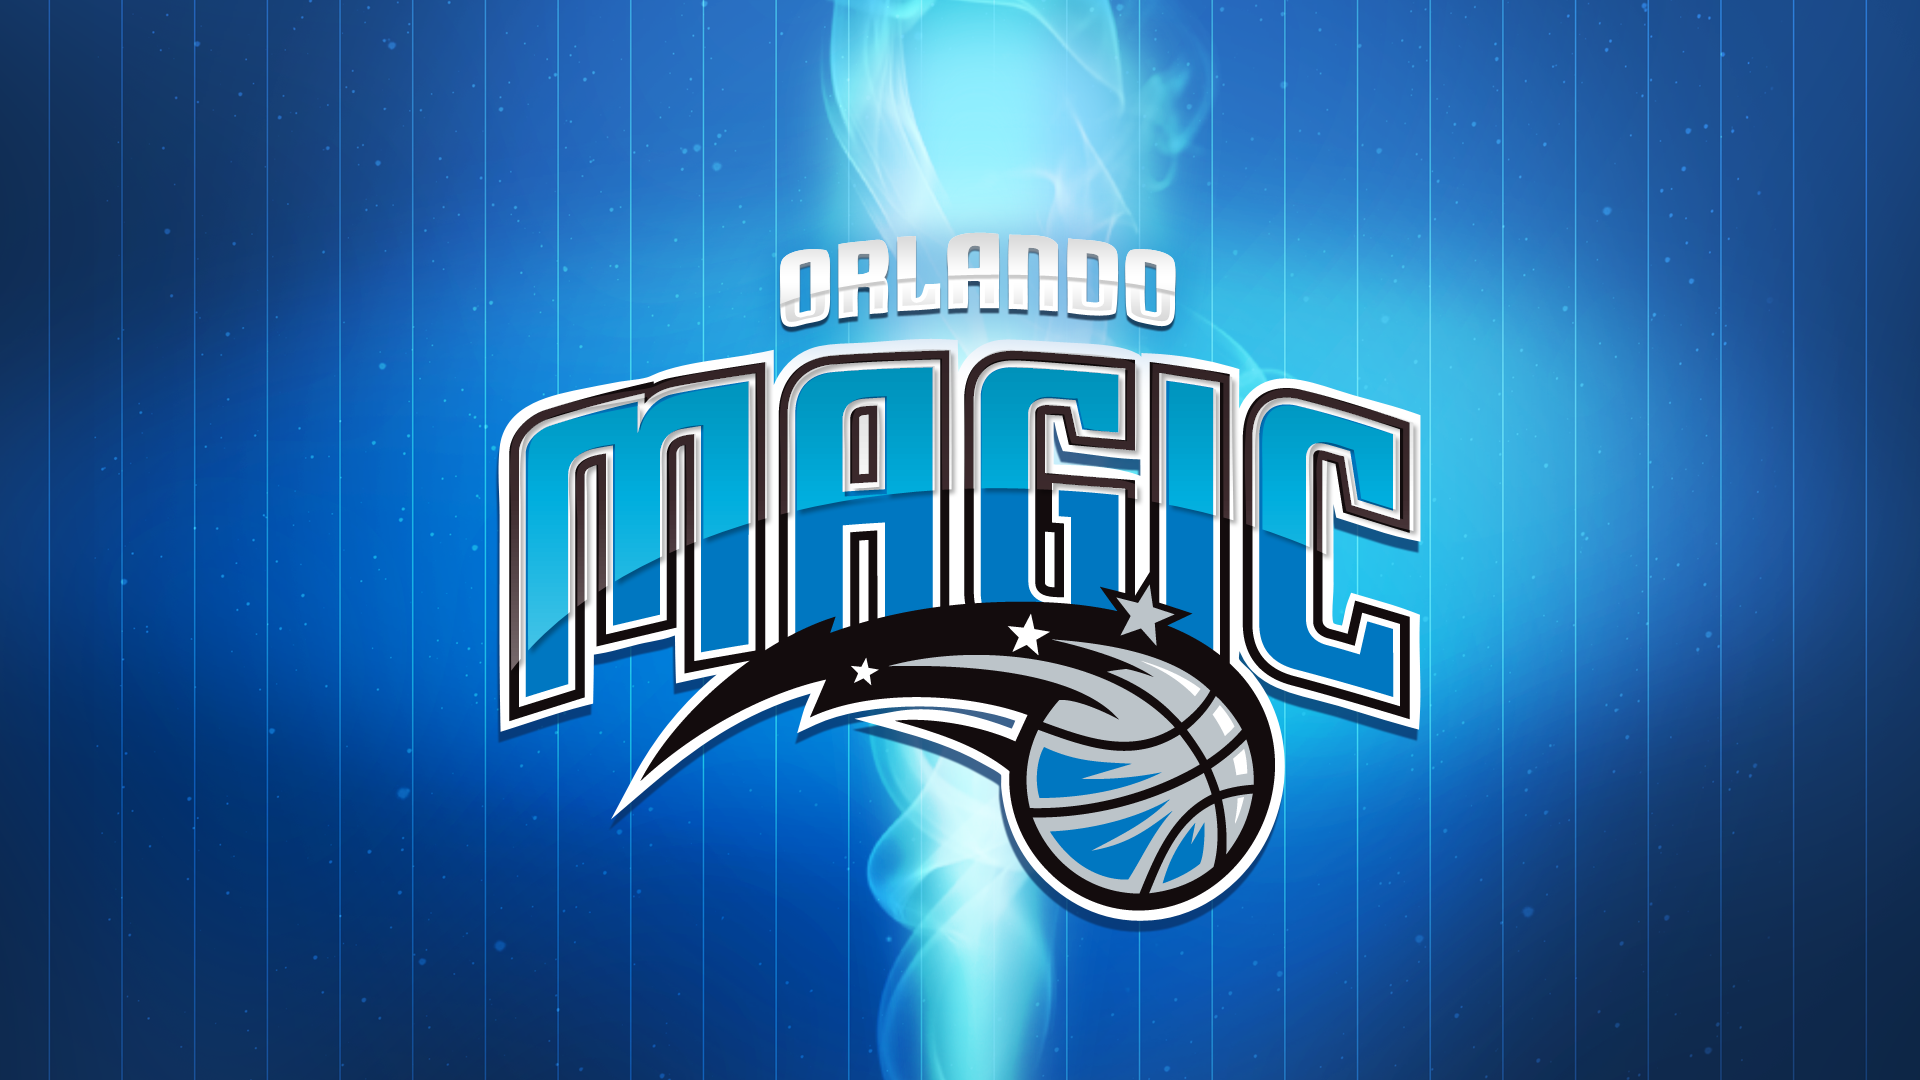 Orlando Magic Wallpapers 1920x1080